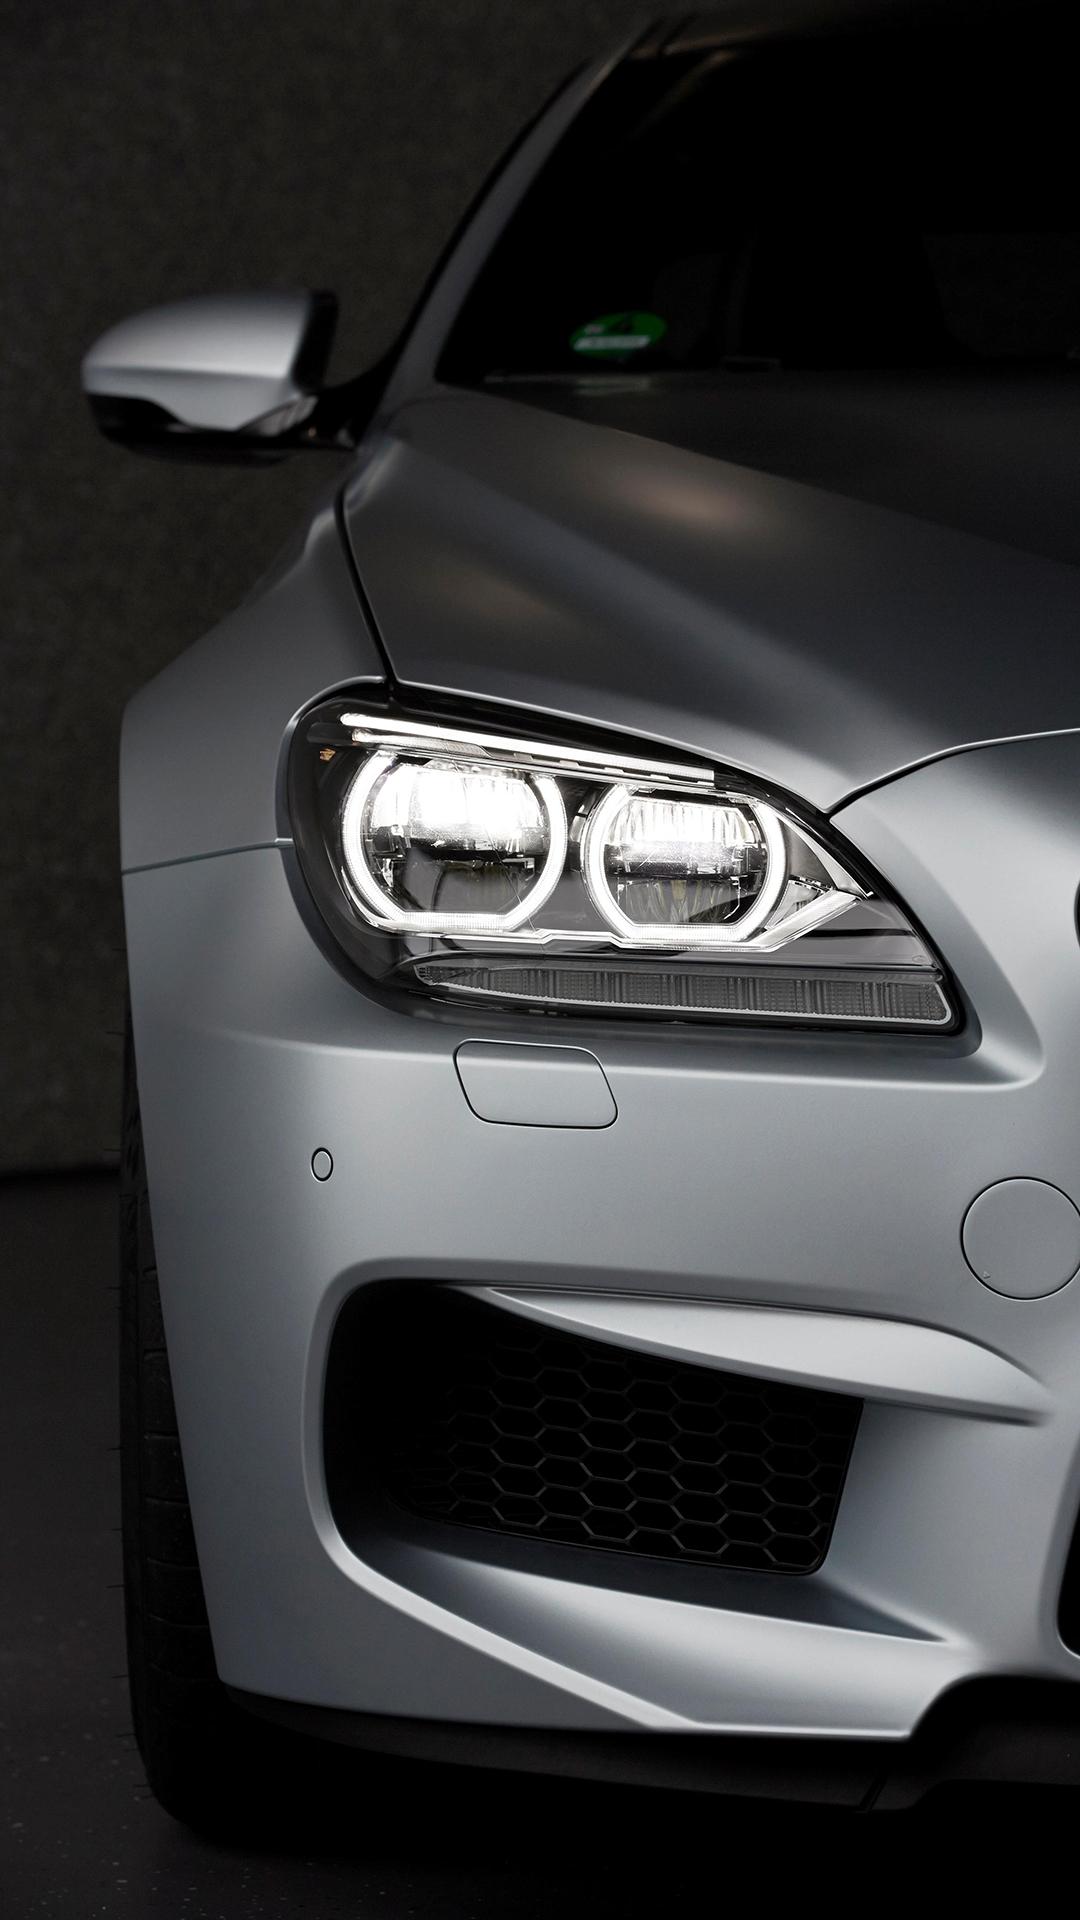 BMW M6 Gran Coupe htc one wallpaper